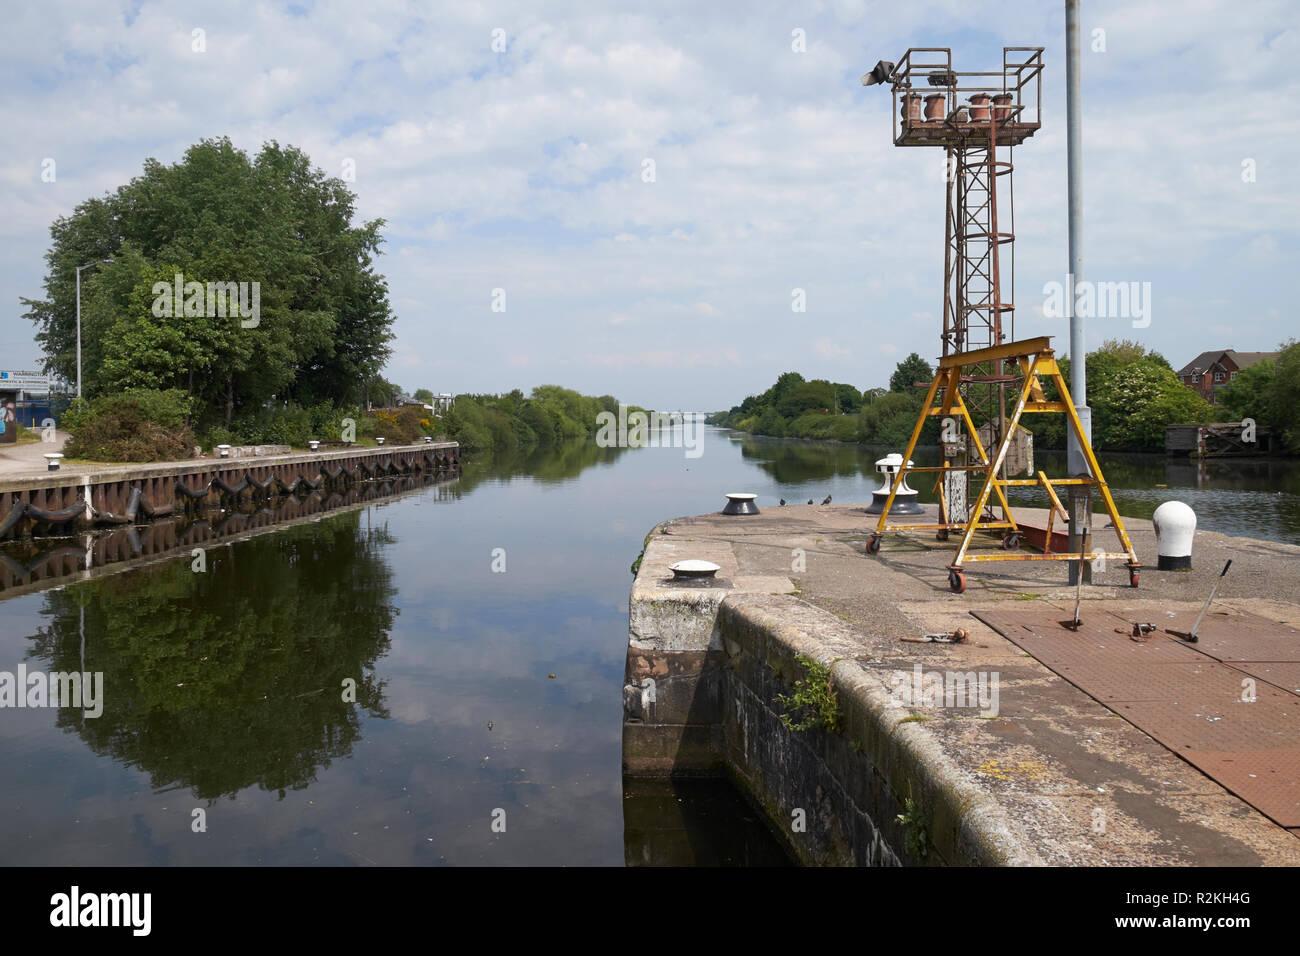 The Manchester Ship Canal at Latchford Locks, Warrington, Cheshire, UK. Stock Photo